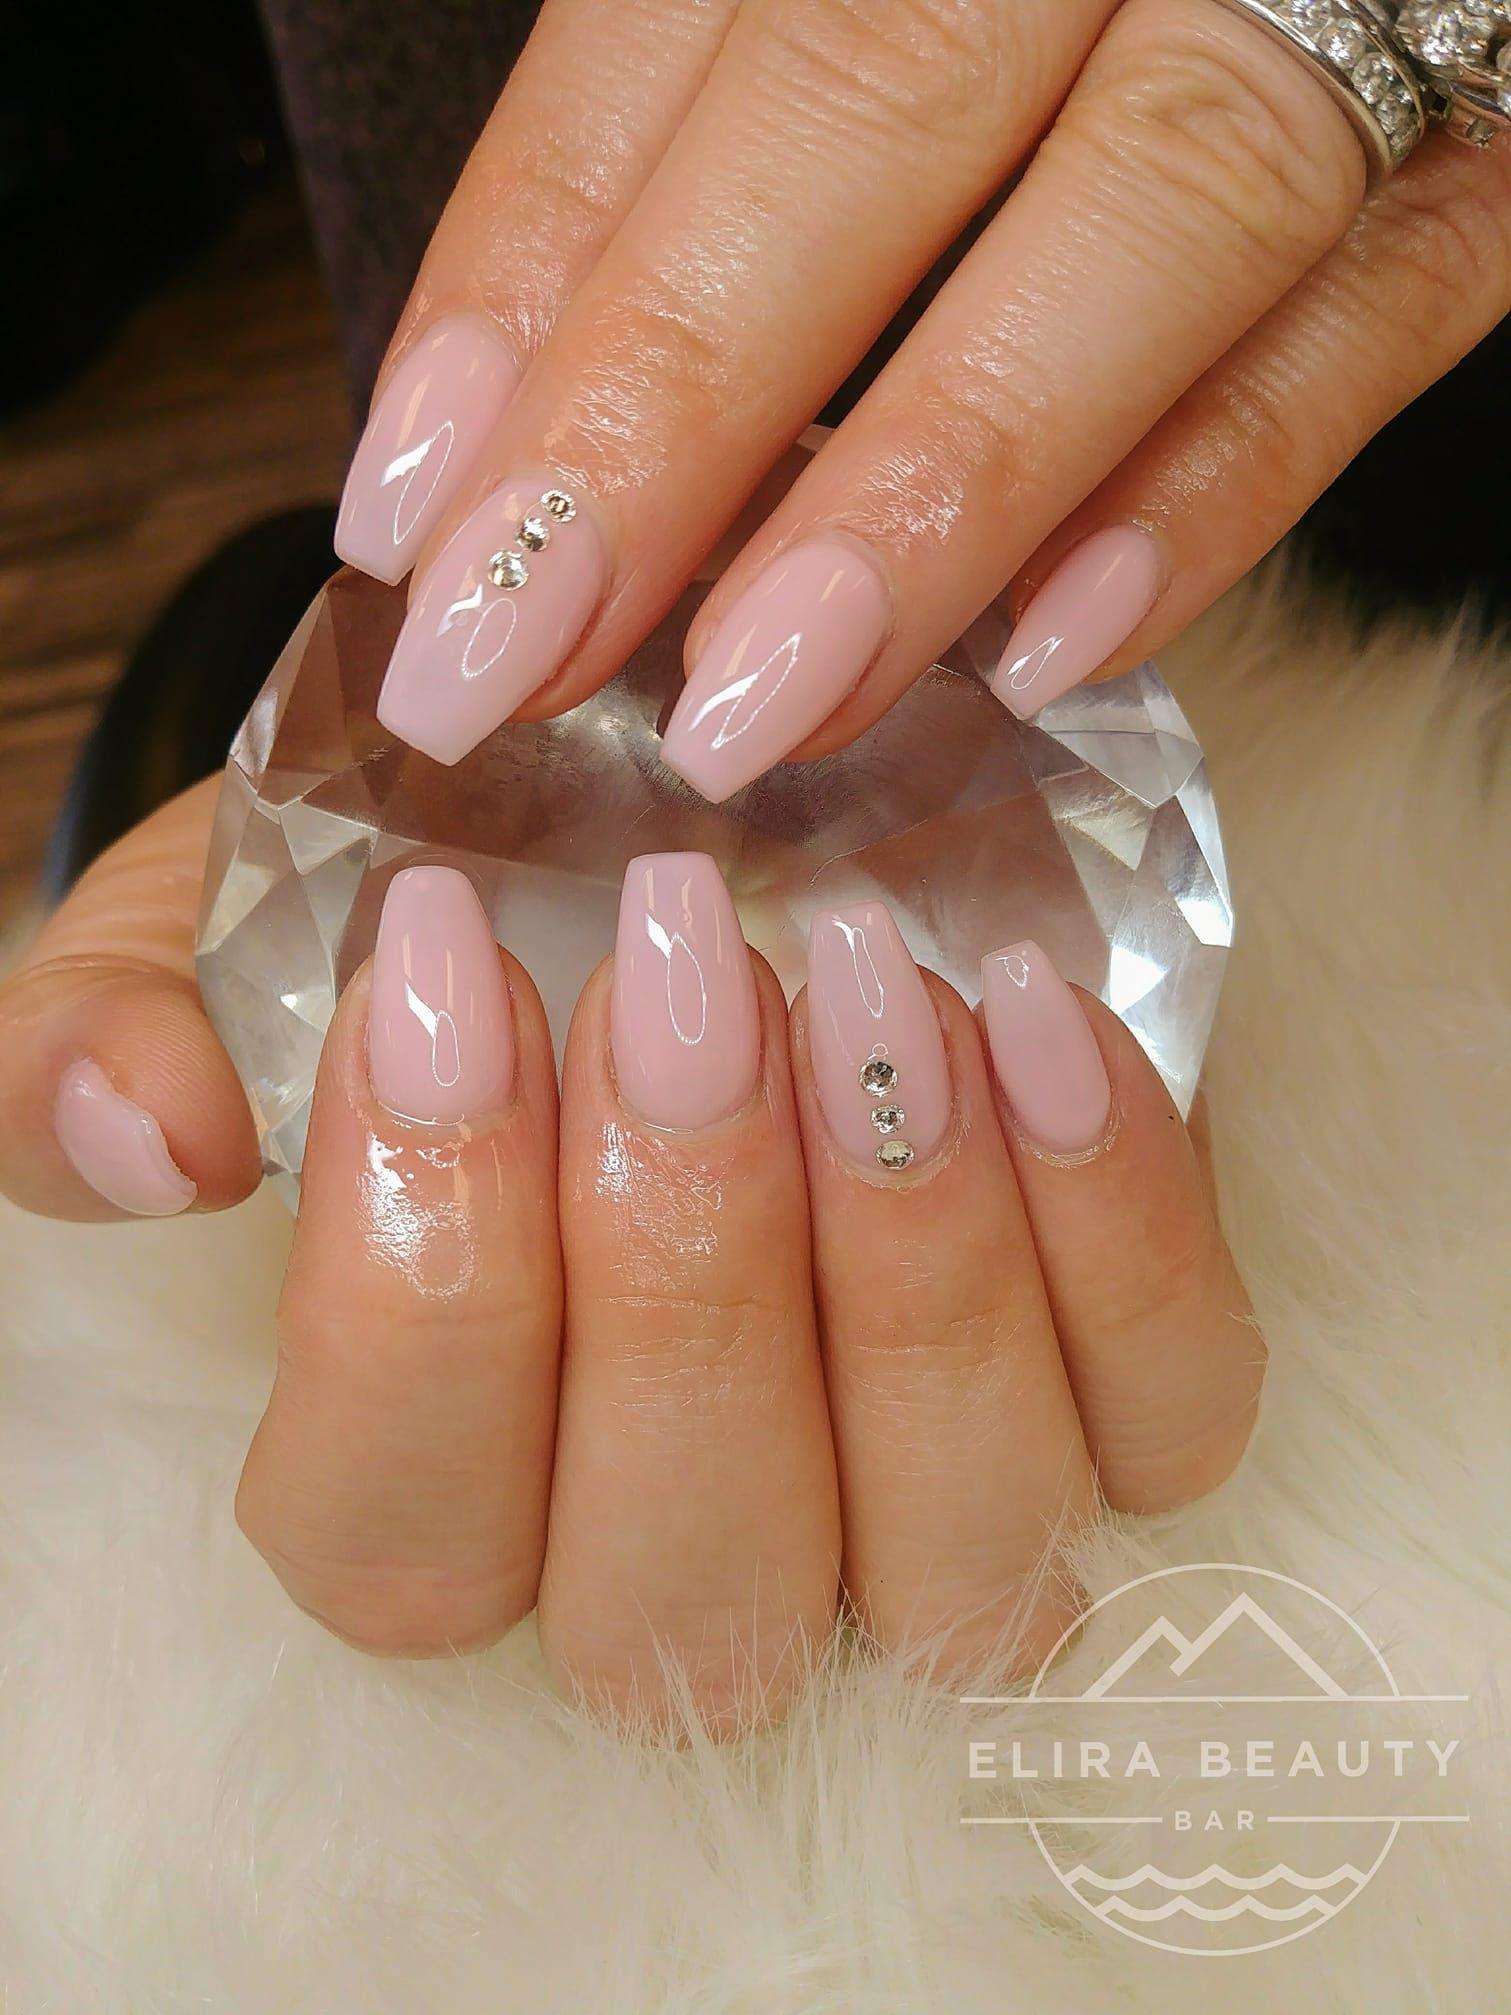 Pink Nails With Stones Nails Pretty Acrylic Nails Cute Acrylic Nail Designs